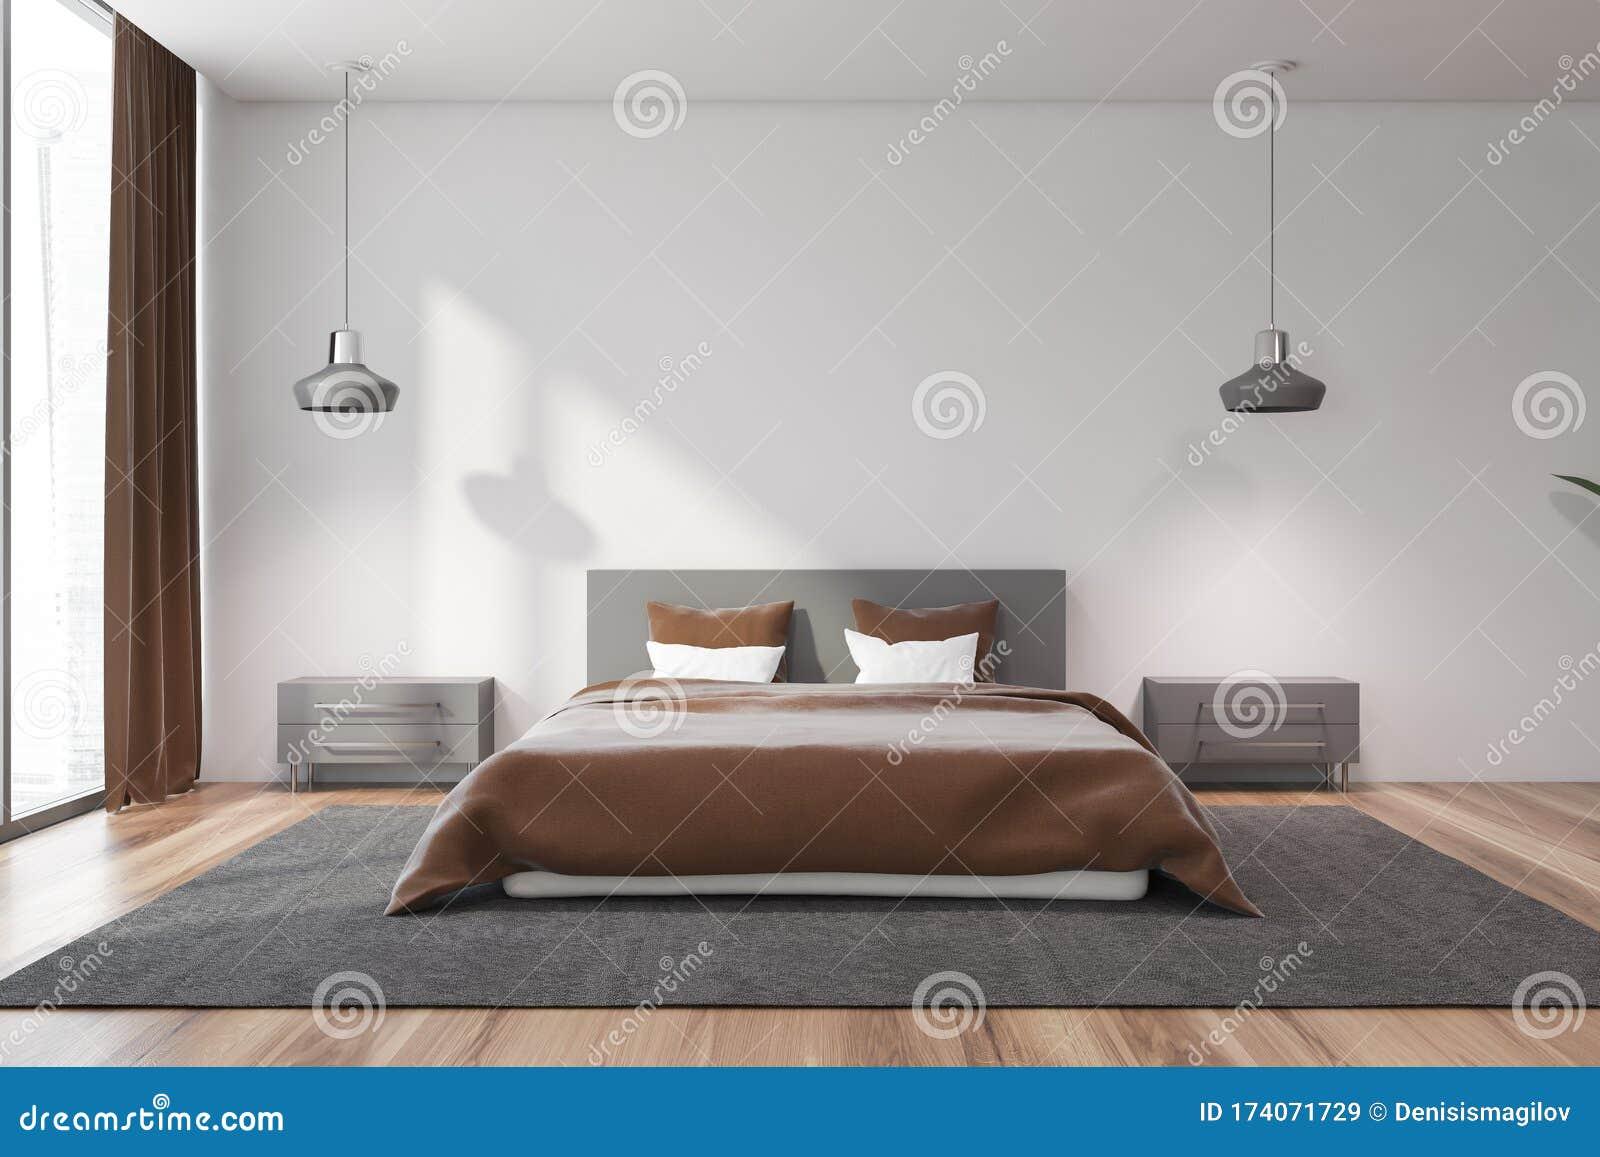 White Master Bedroom Interior With Brown Bed Stock Illustration Illustration Of Elegant Blanket 174071729